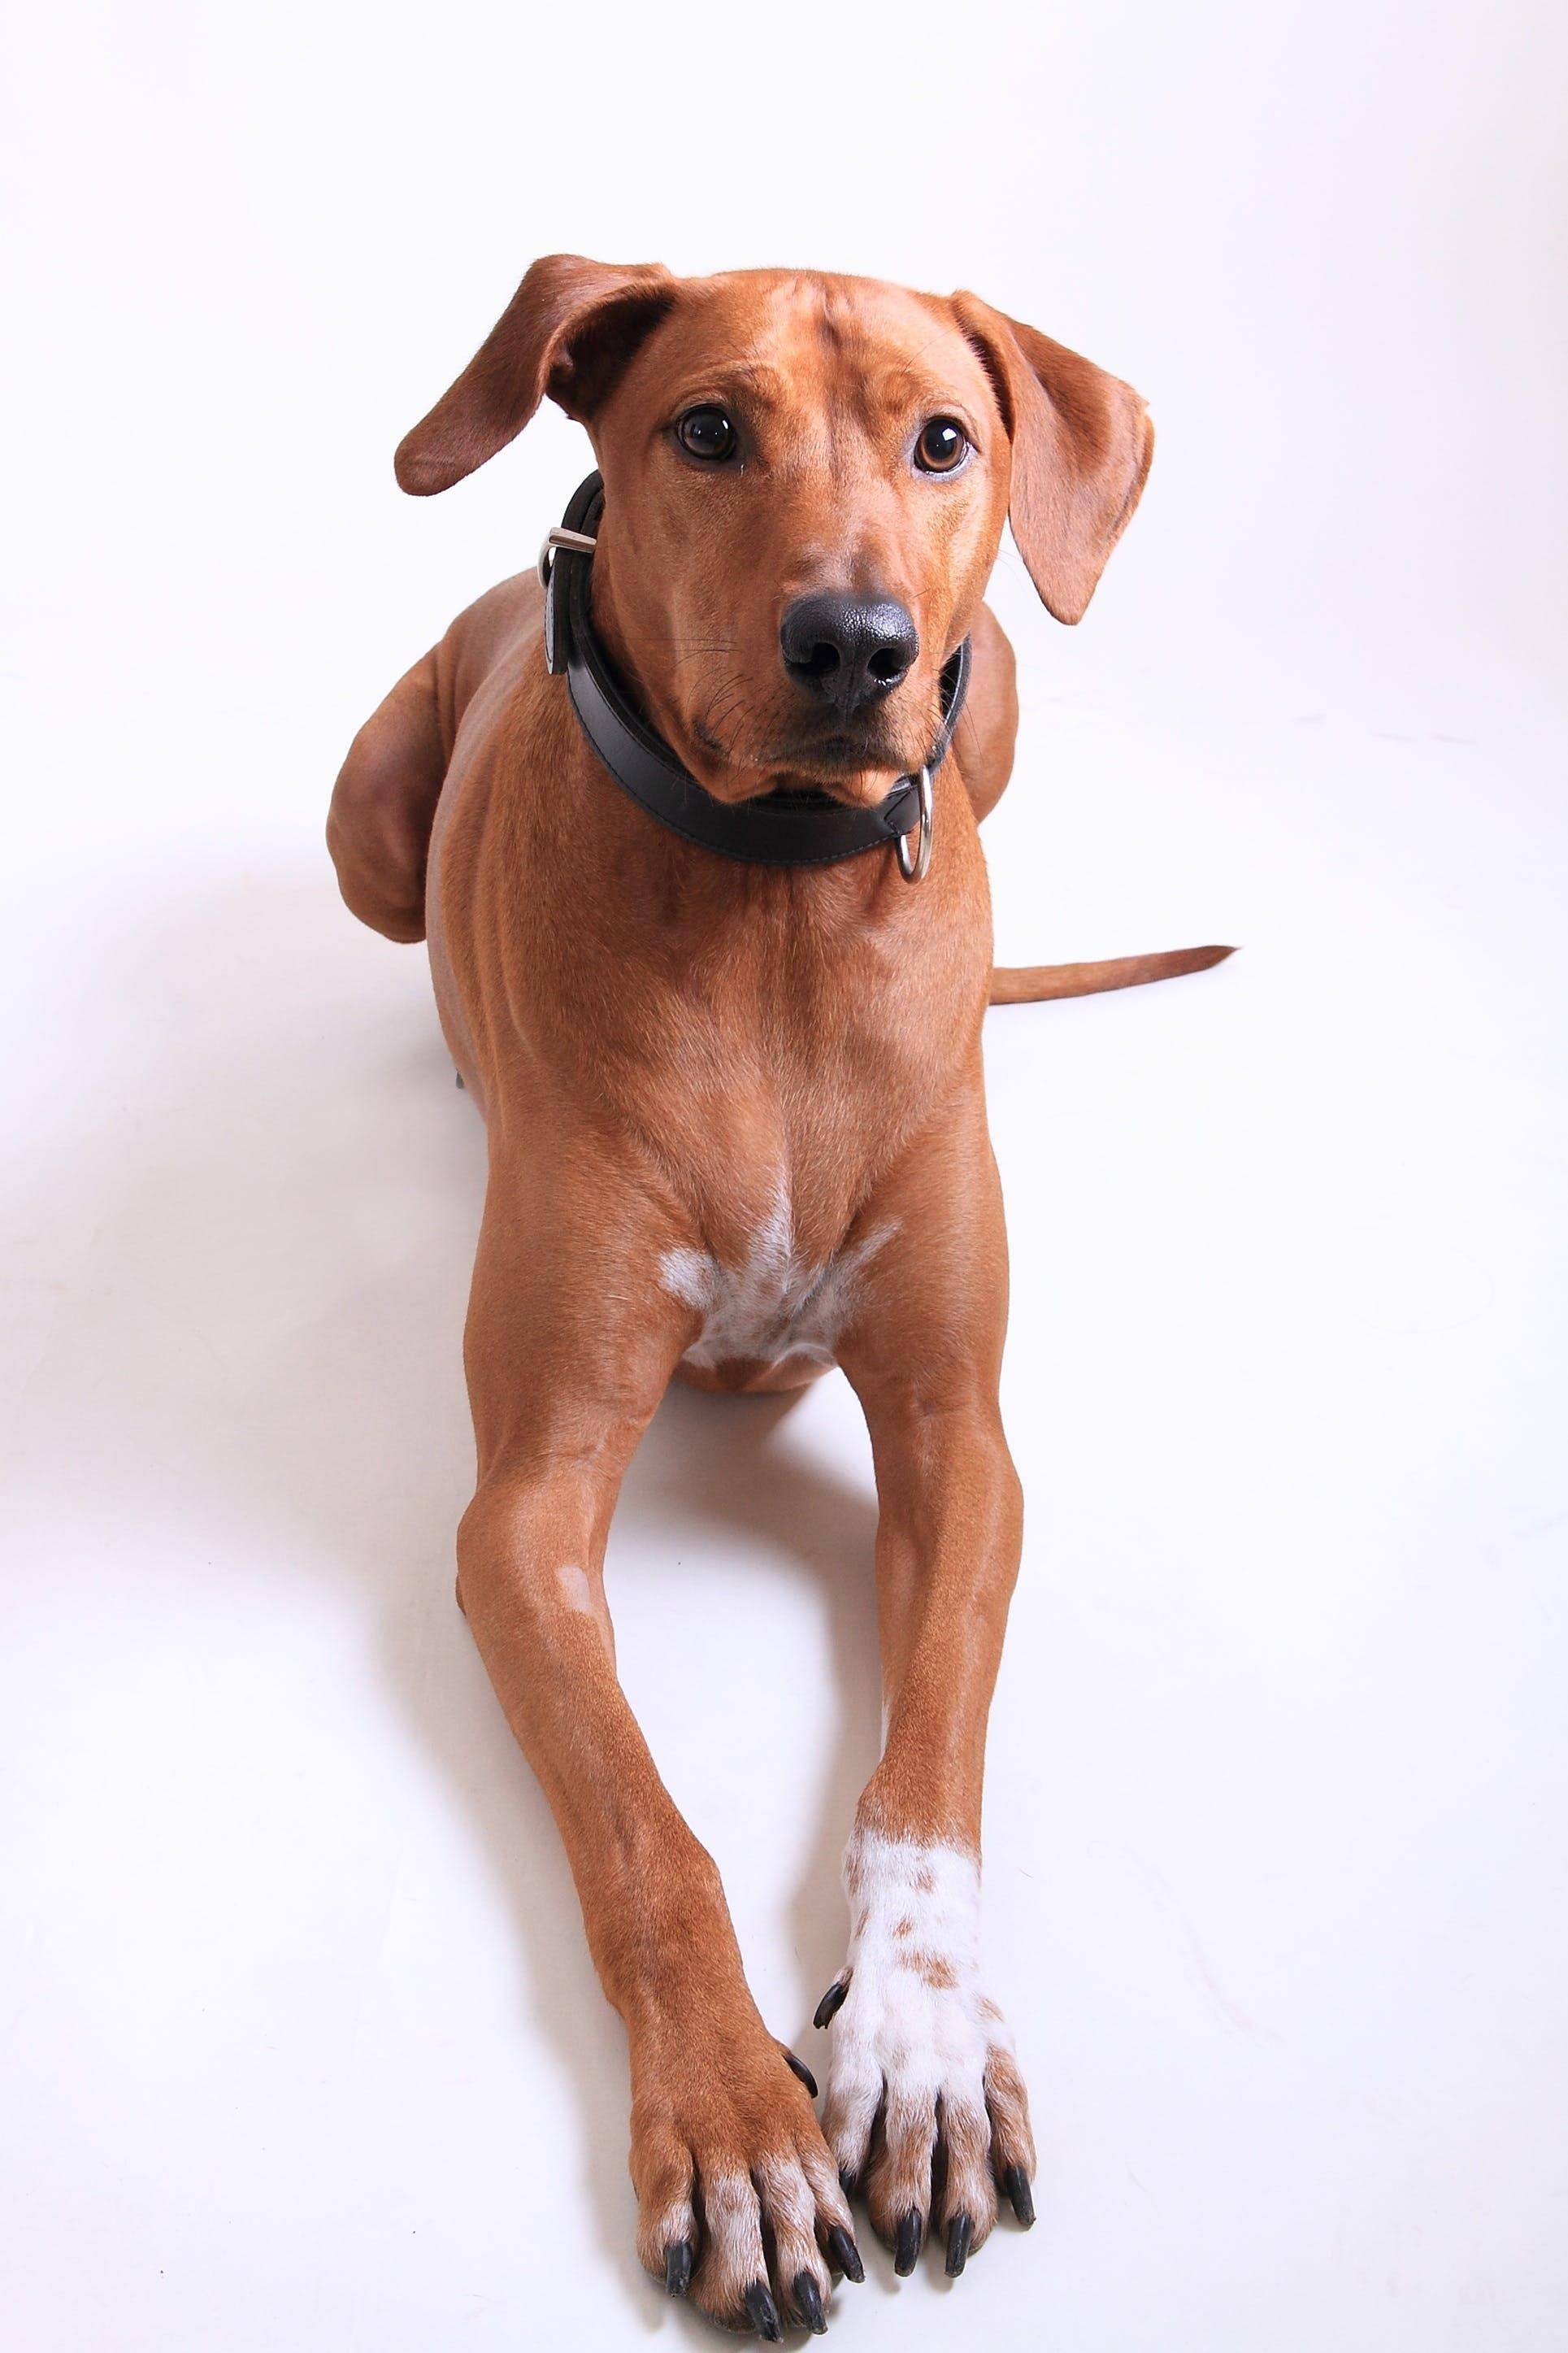 animal, breed, canine